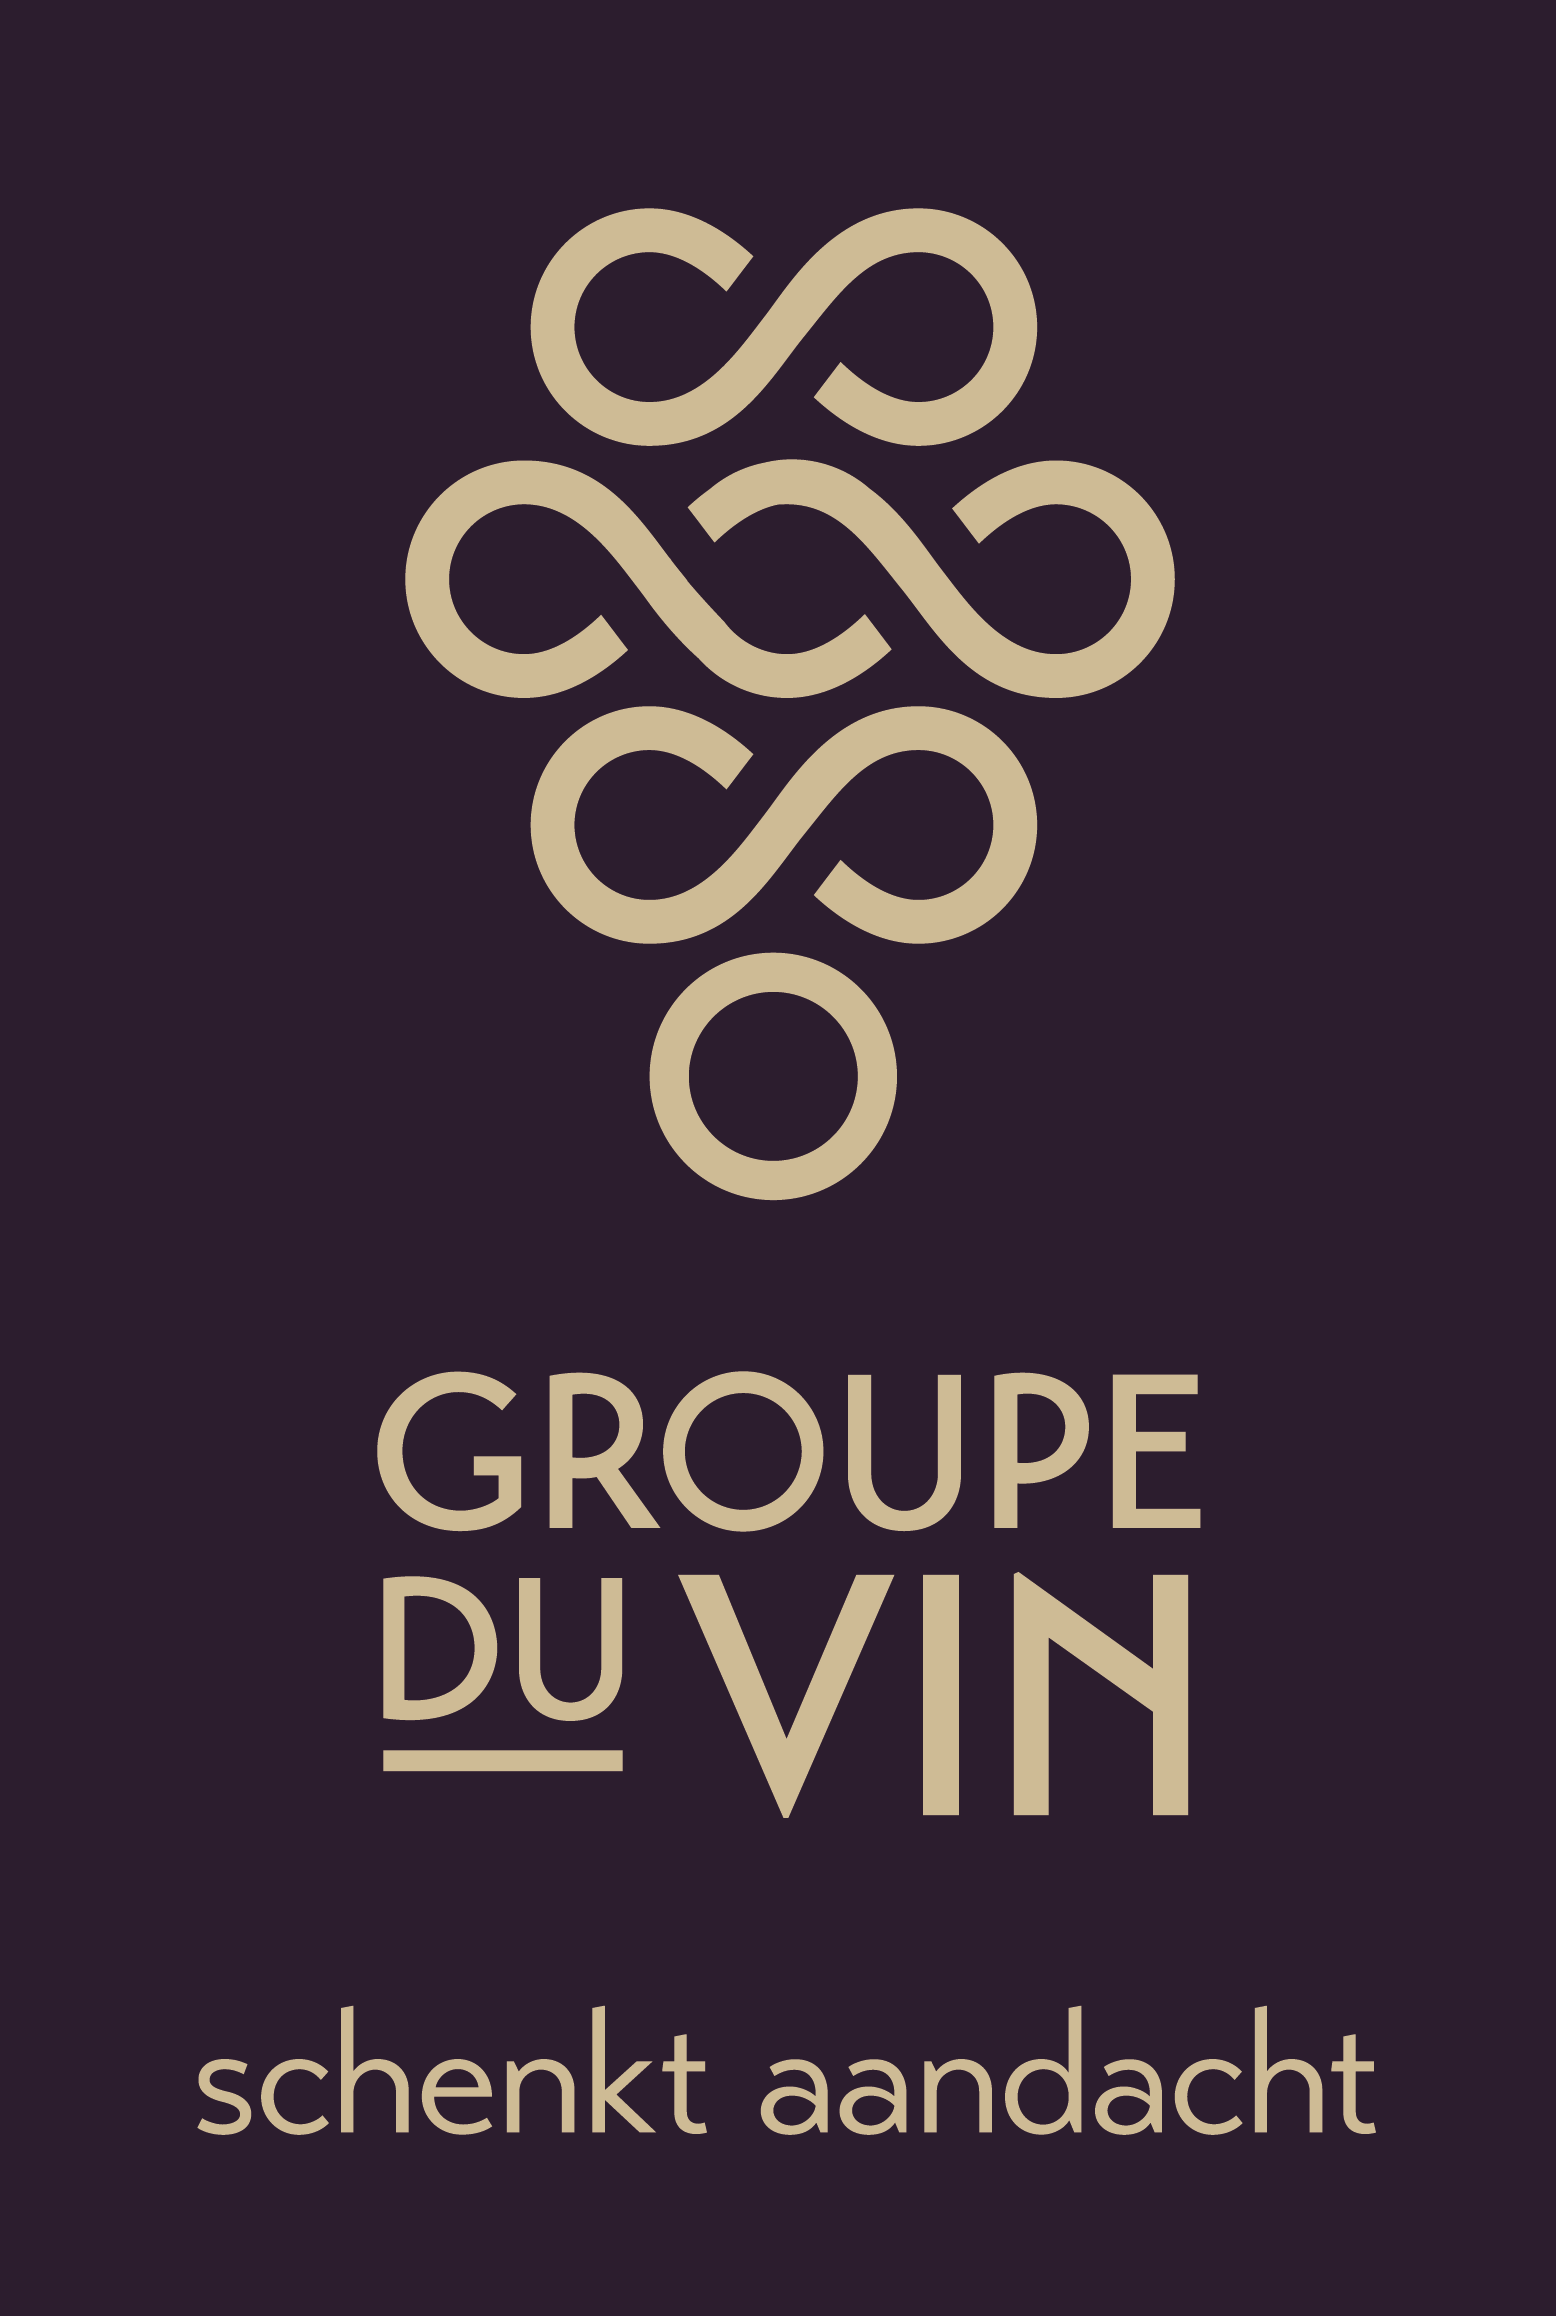 GROUPE-DU-VIN-Logo-300x275